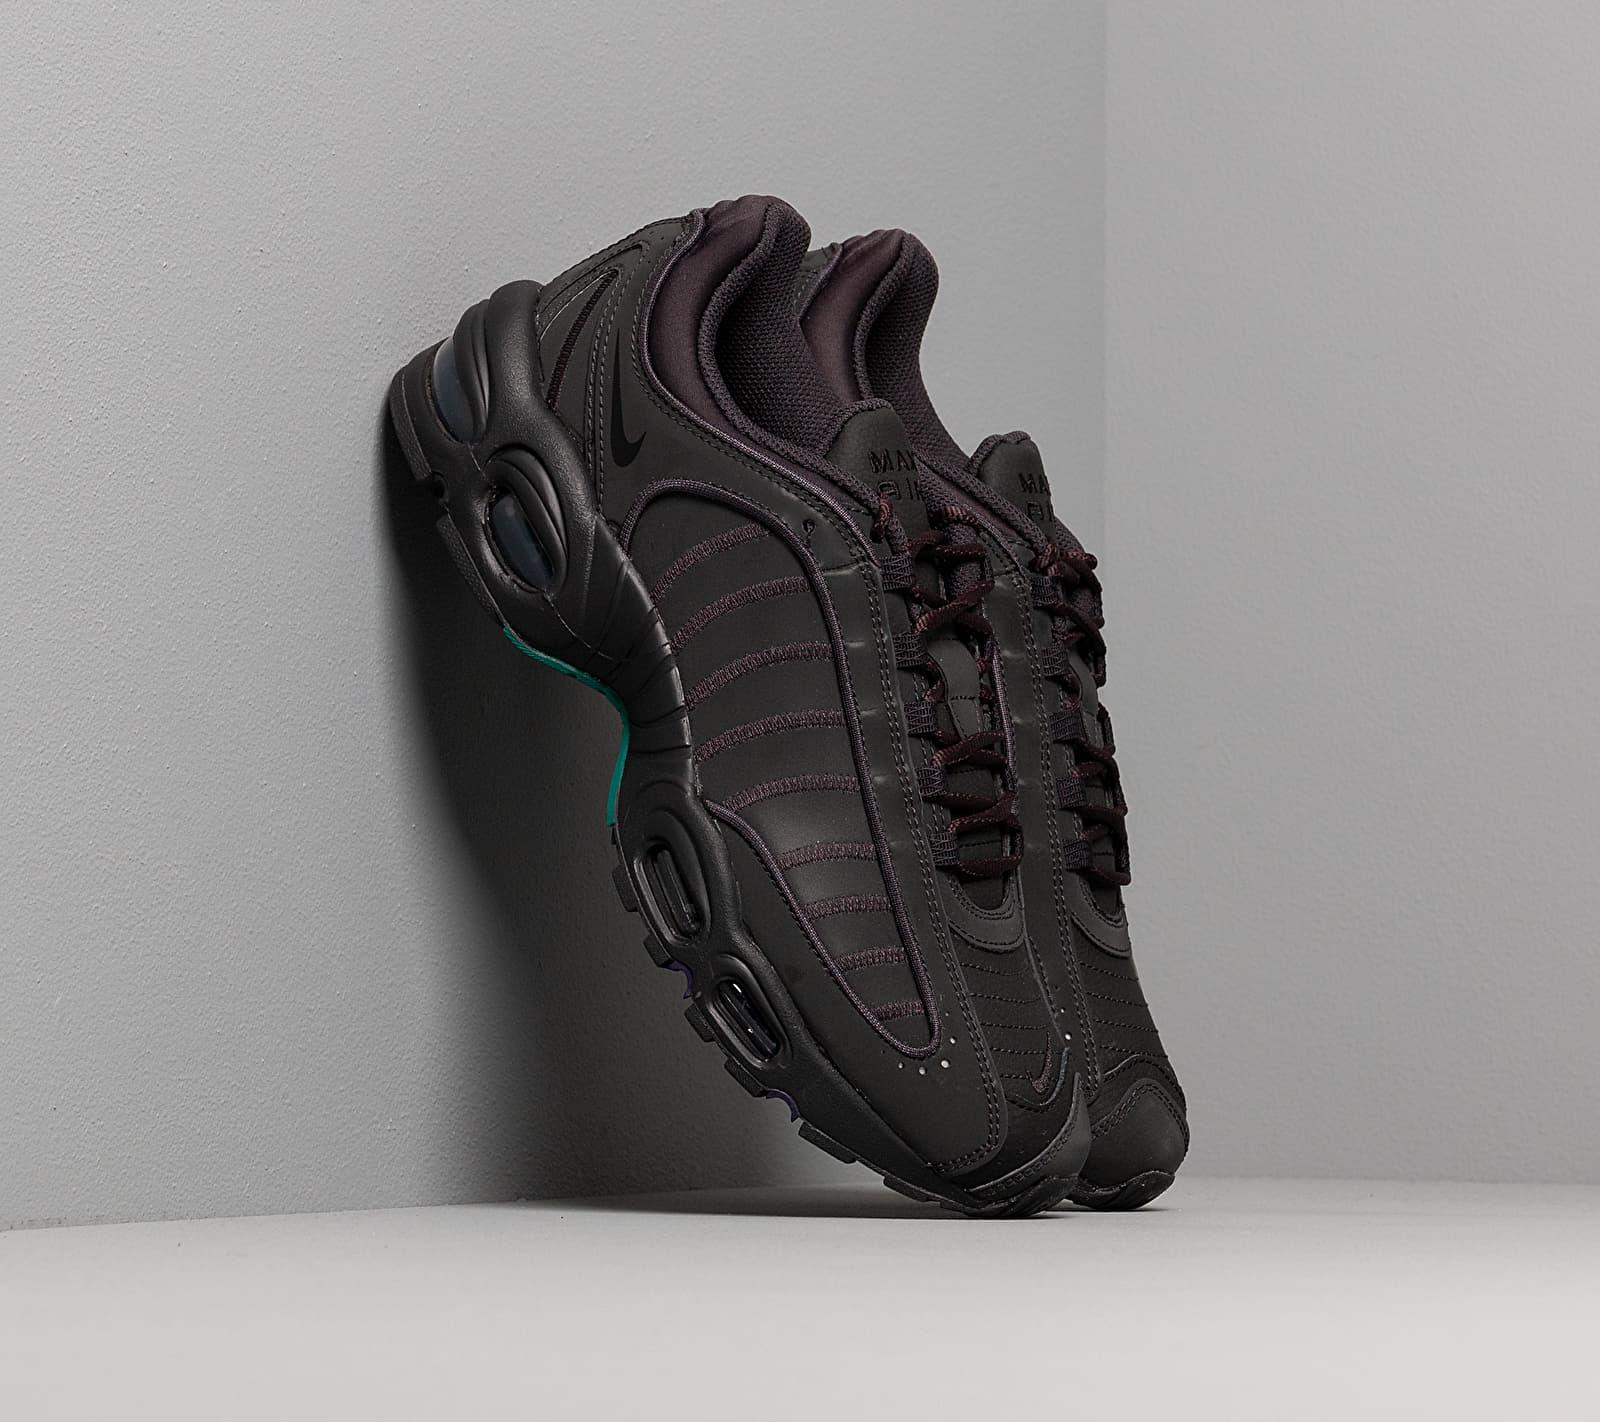 Nike Air Max Tailwind '99 Sp Black/ Black-Oil Grey CQ6569-001